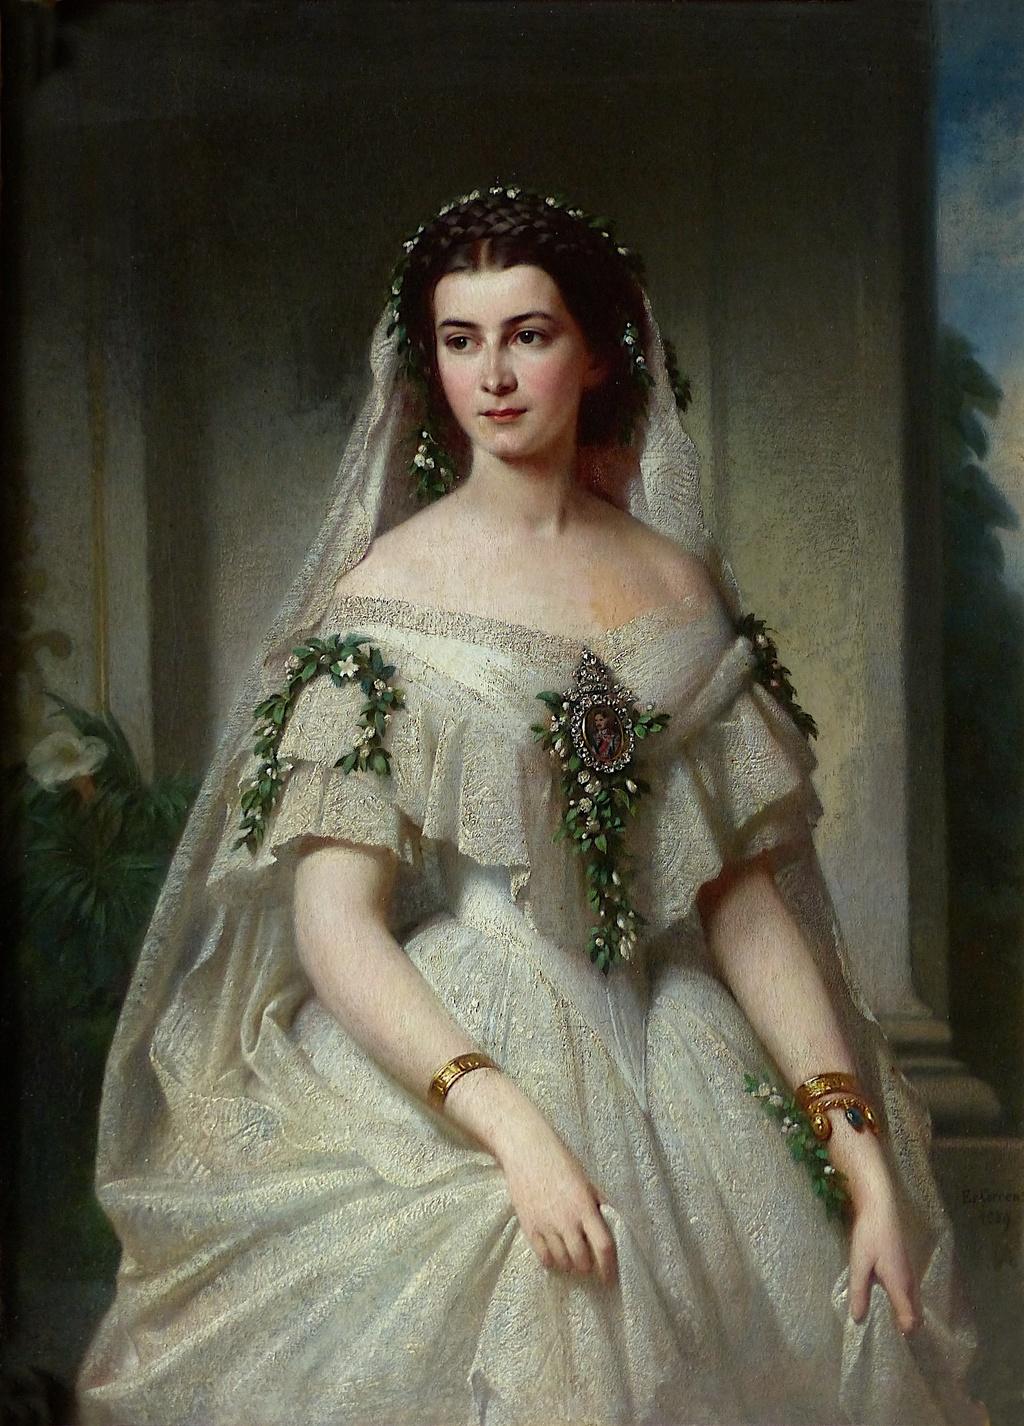 File:Marie als Braut.jpg - Wikimedia Commons